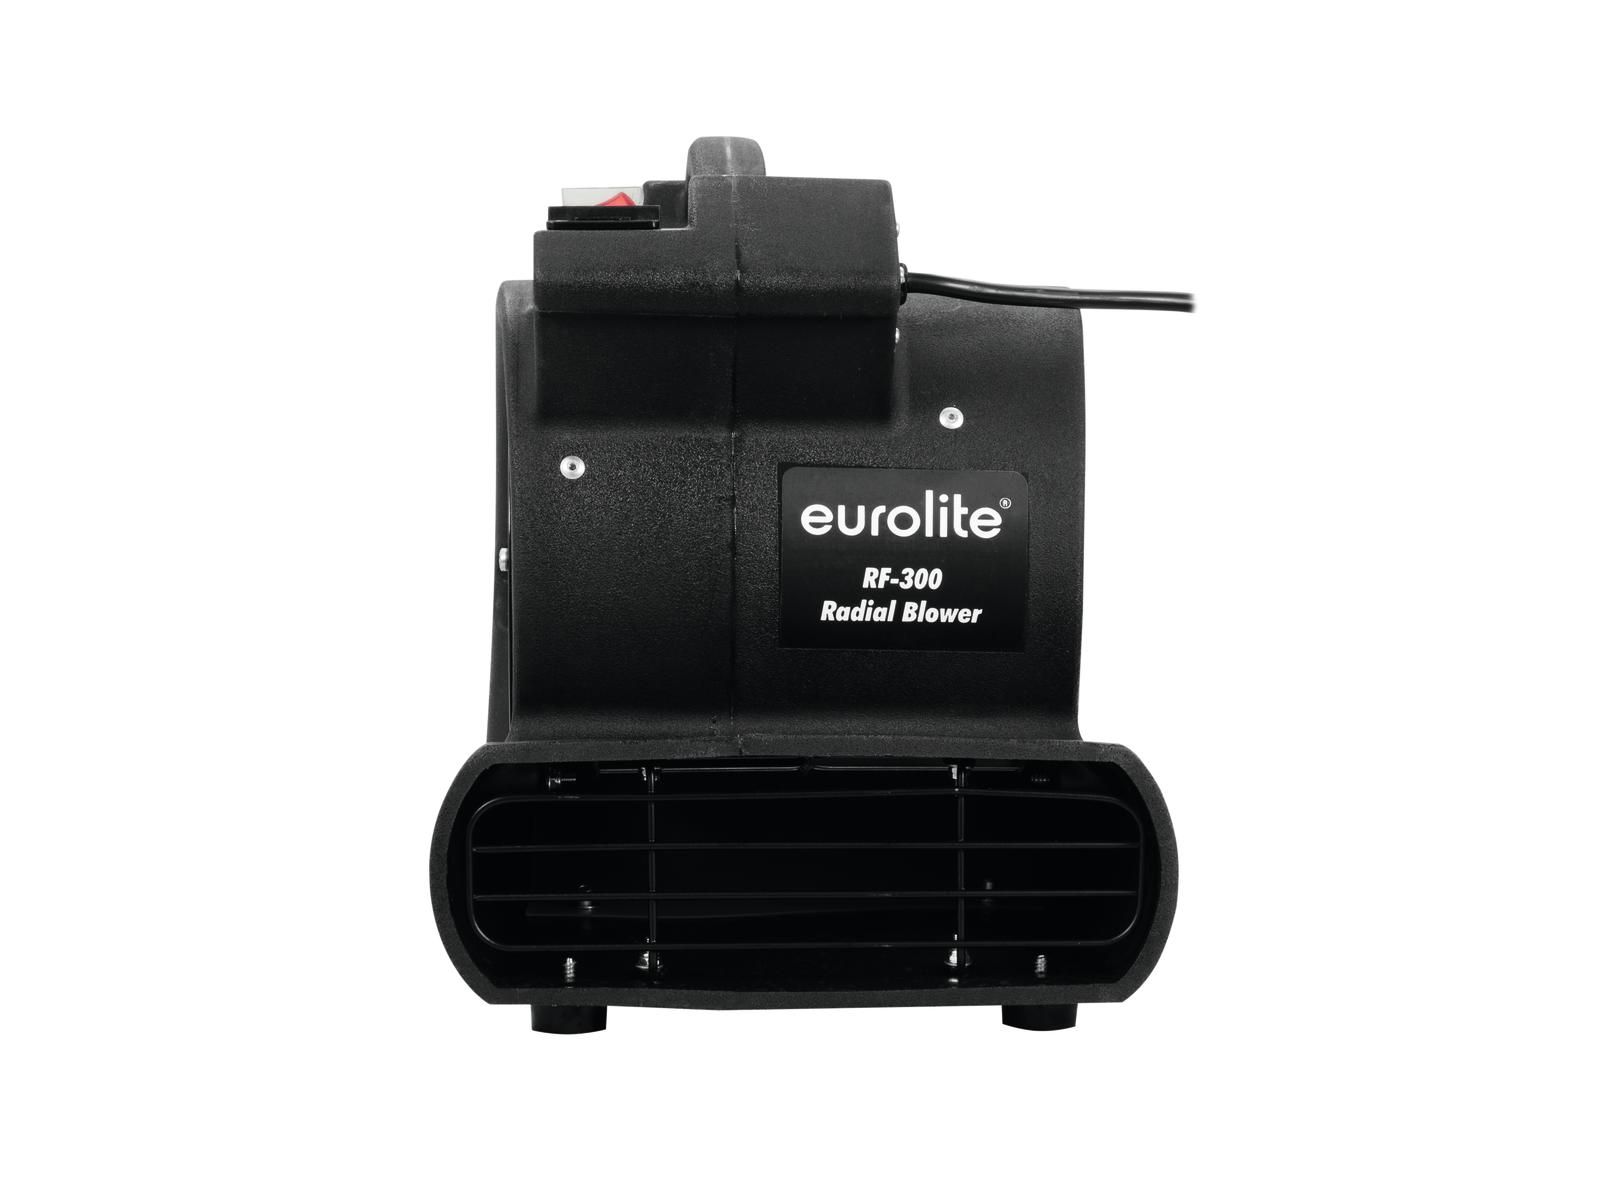 Eurolite RF-300, radiální ventilátor